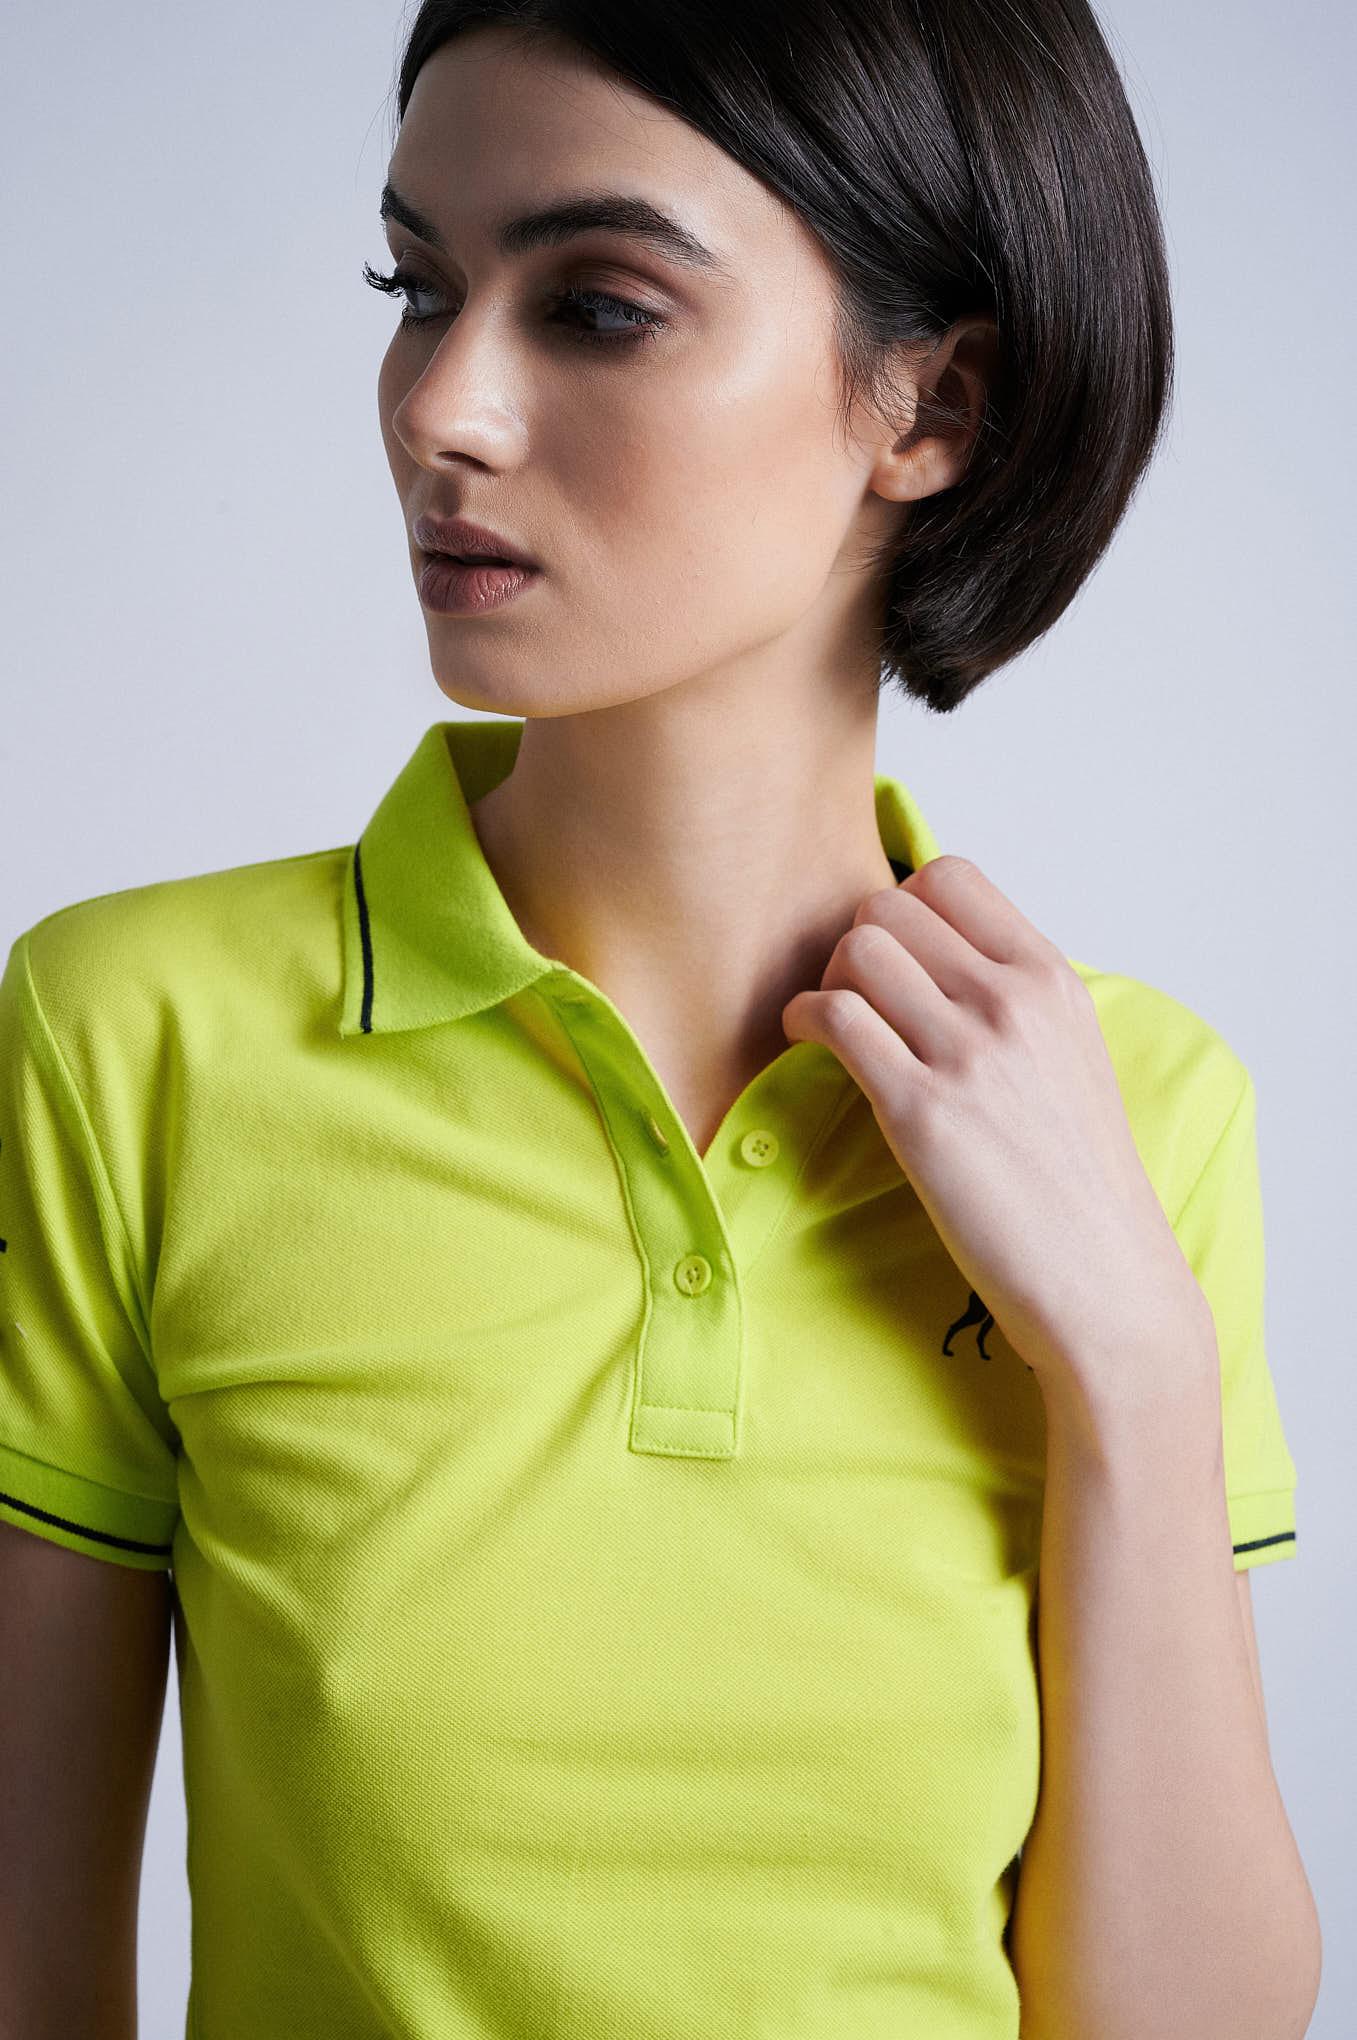 Polo Piquet Lemonade Sport Woman